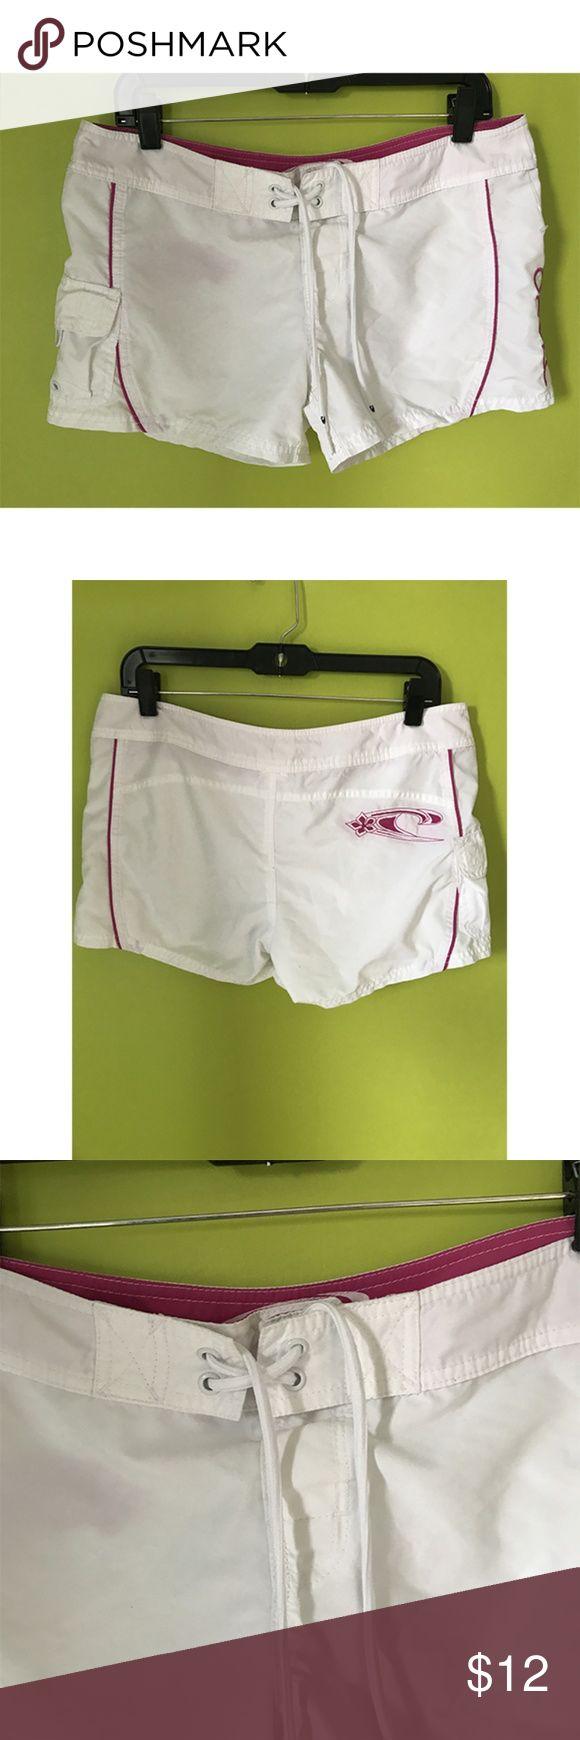 "O'Neill Swim Shorts Drawstring Waist Sz 9 B457  Swim Shorts  Waist - 32"" Rise - 9"" Inseam - 3""  O'Neill Swim Shorts Drawstring Waist  Front Pockets Violet Lined White Size 9  Free shipping on orders over $75 O'Neill Swim"